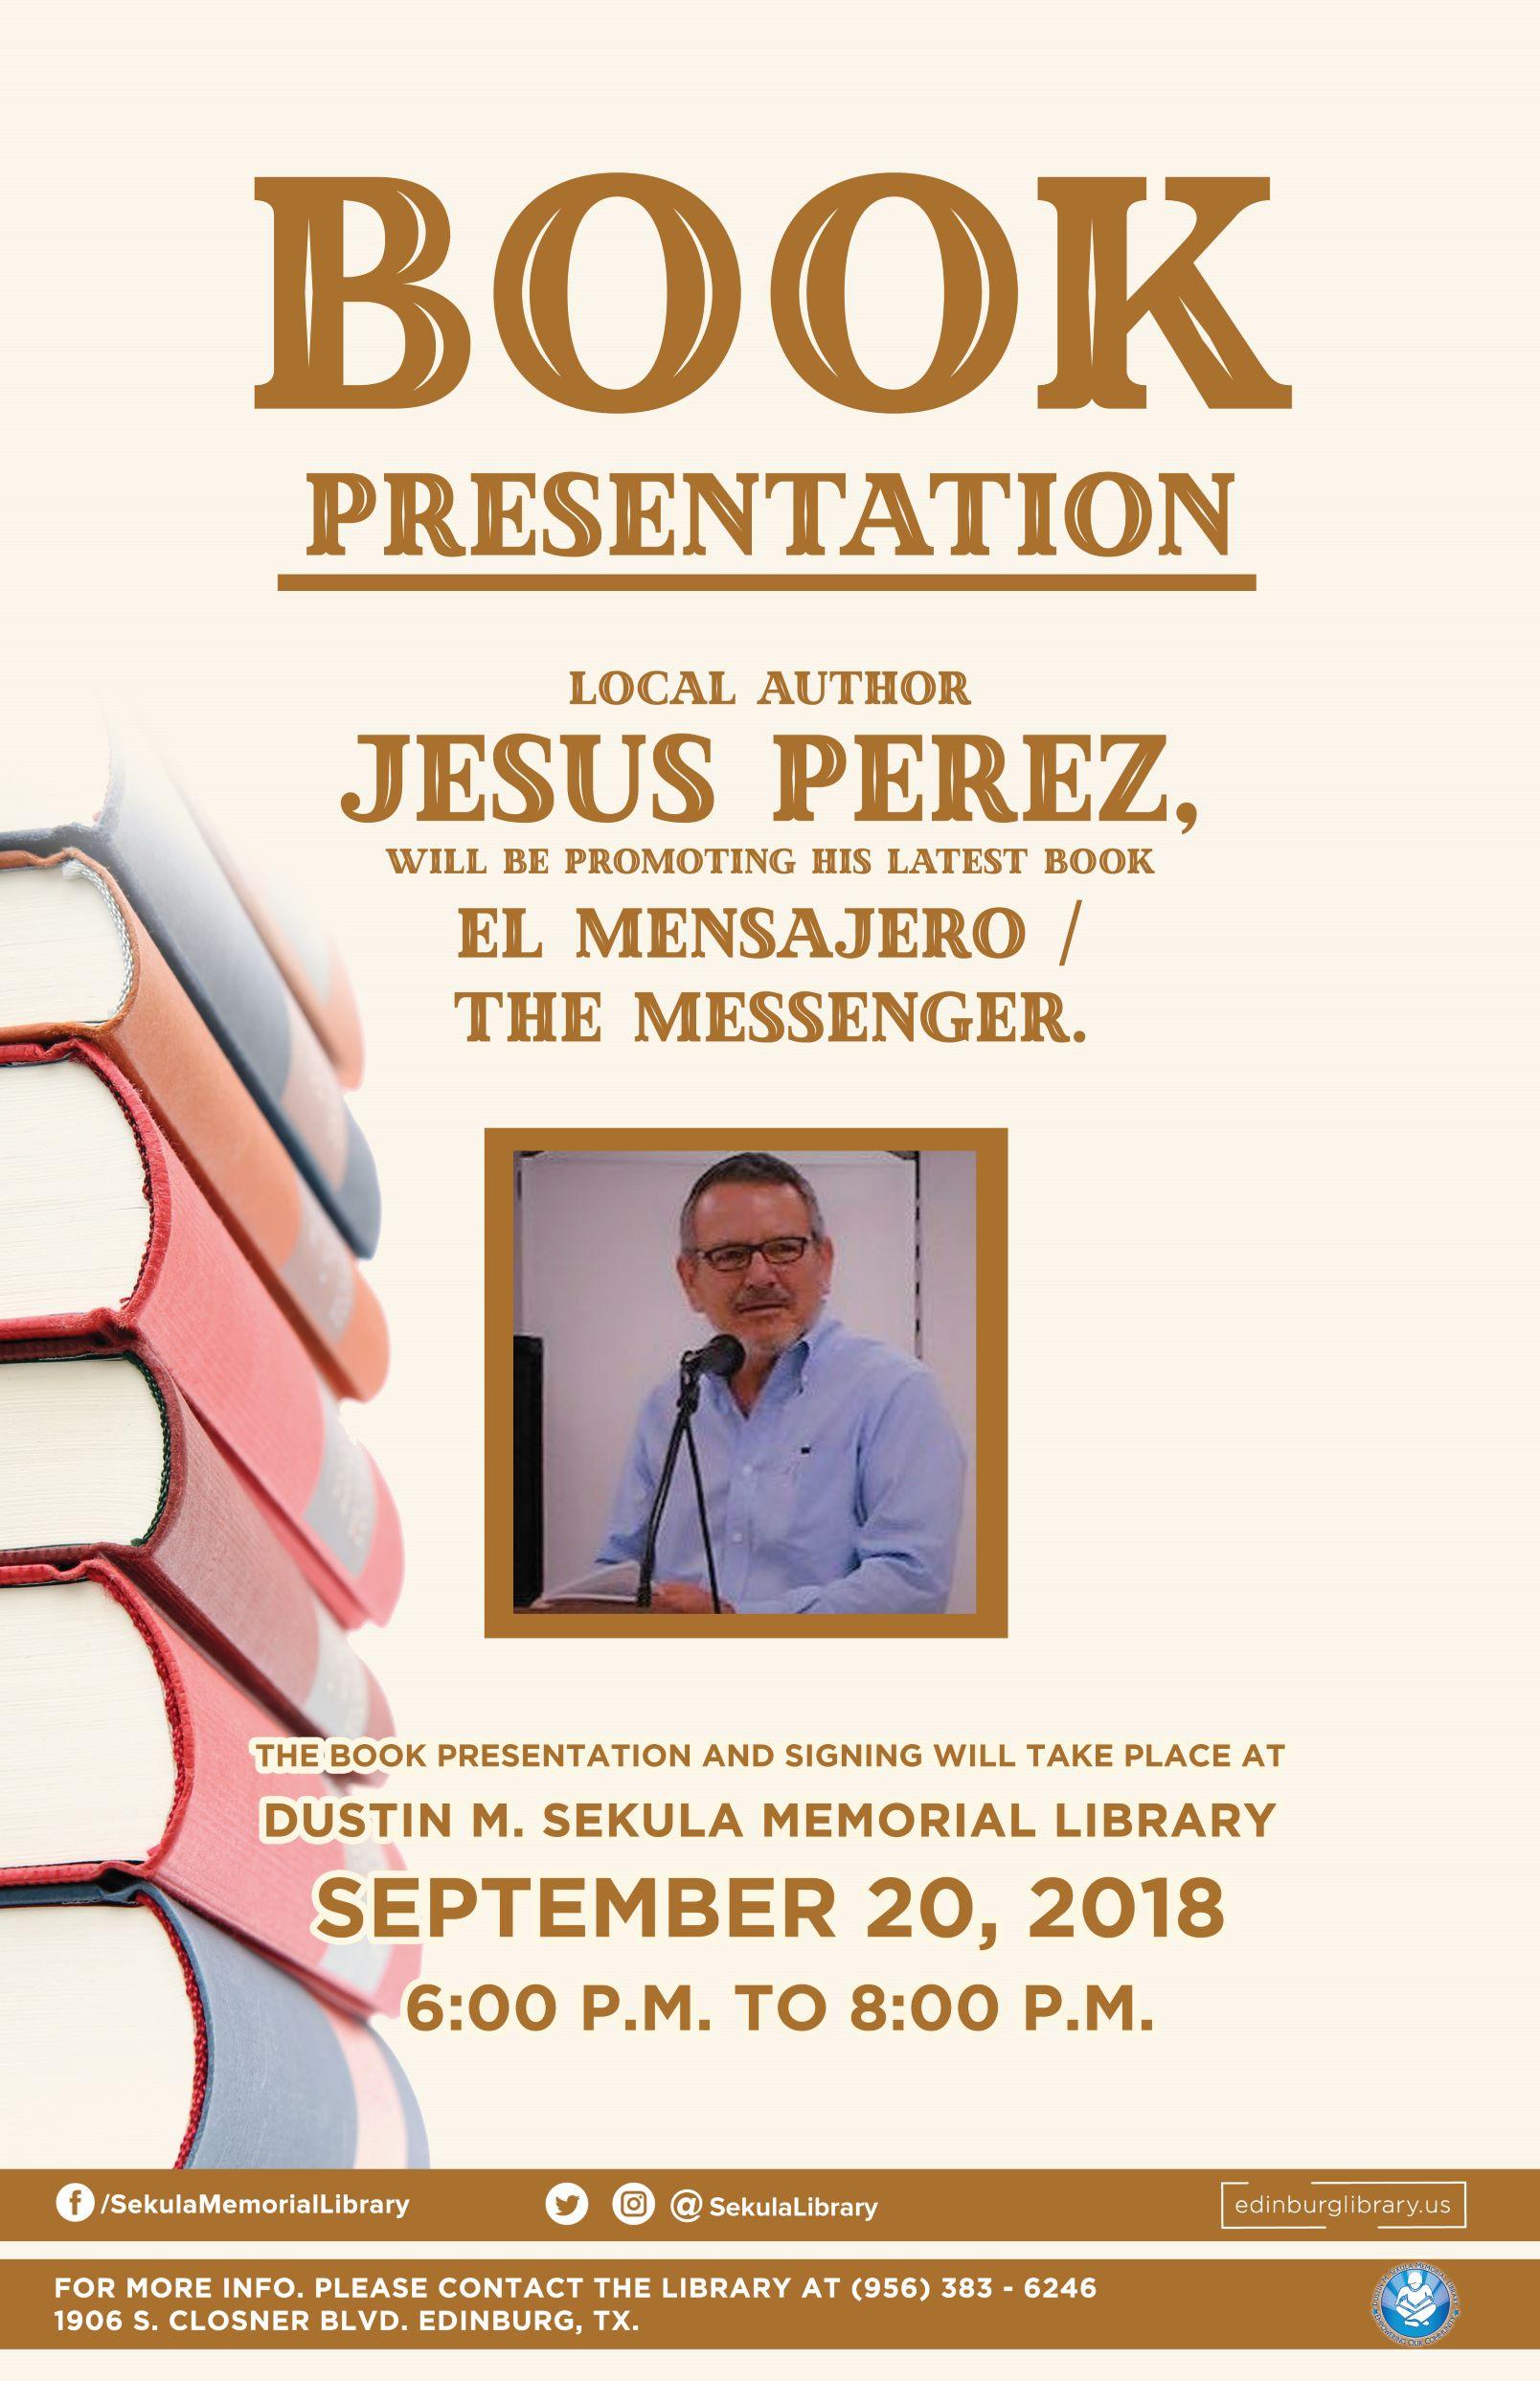 jesus perez book presentation - resize.jpg